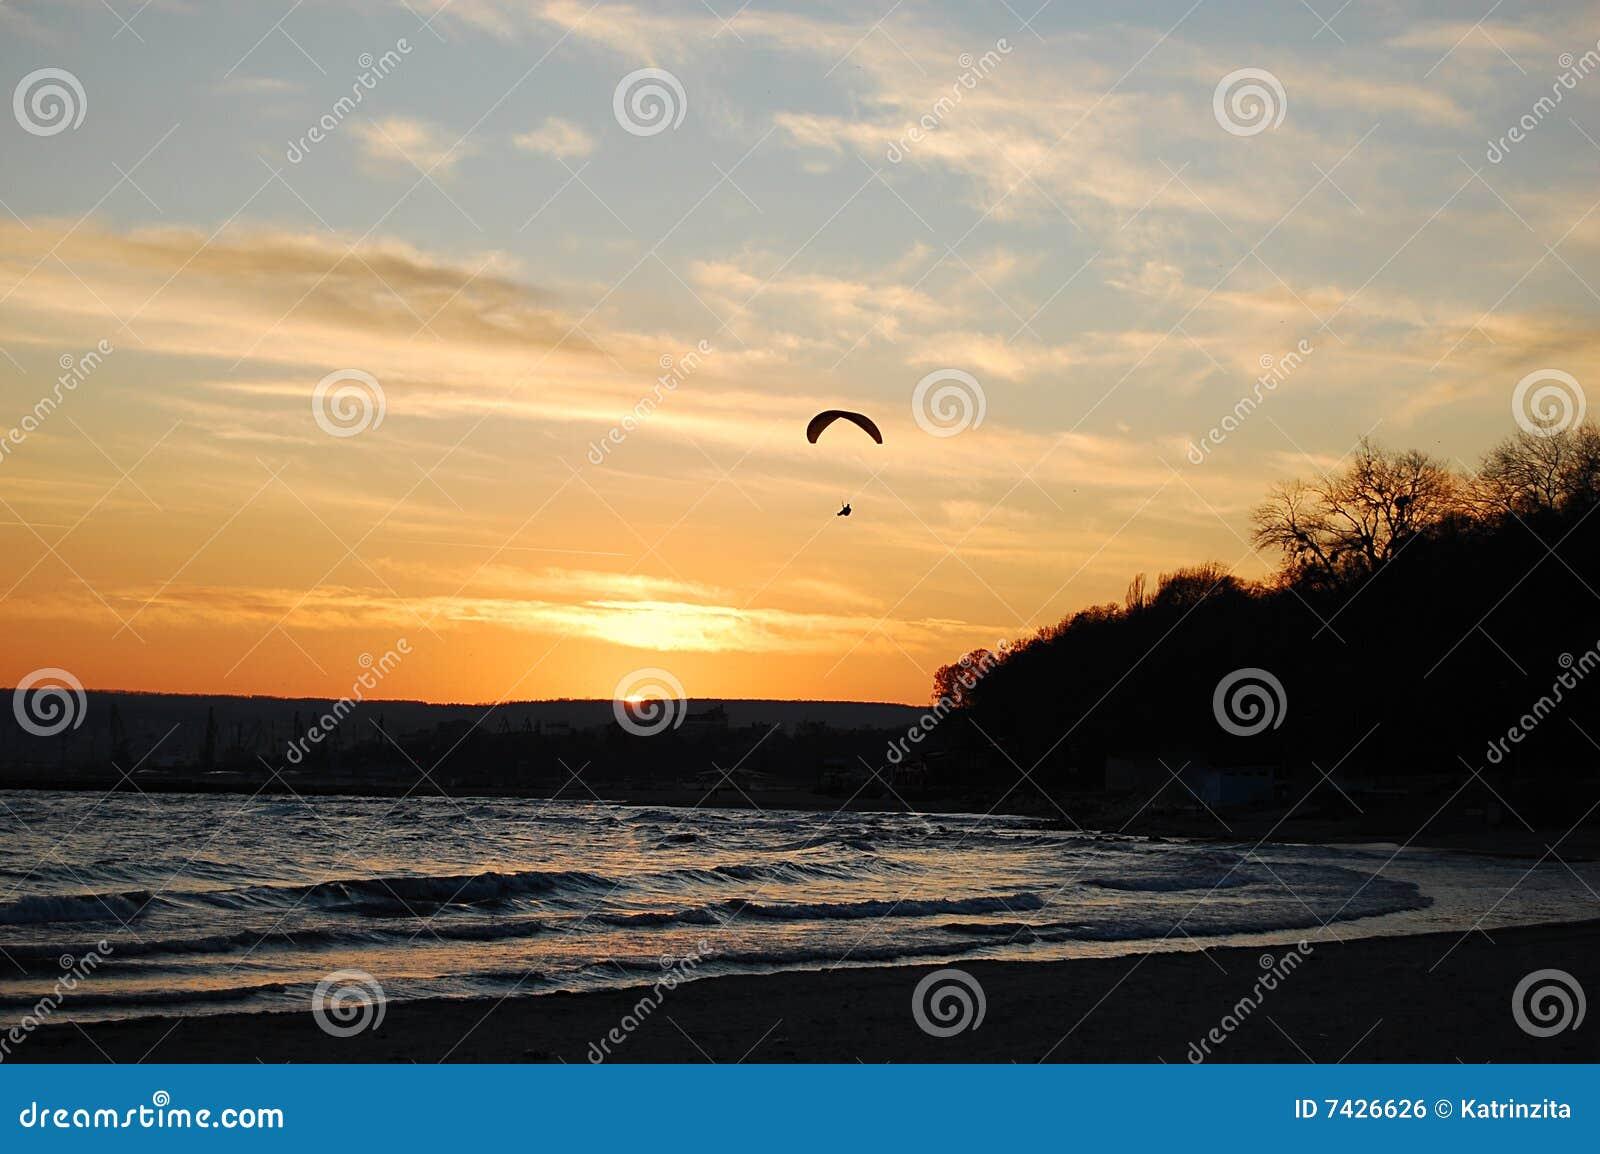 Citaten Over Zonsondergang : Zweefvliegtuig over de zonsondergang stock foto